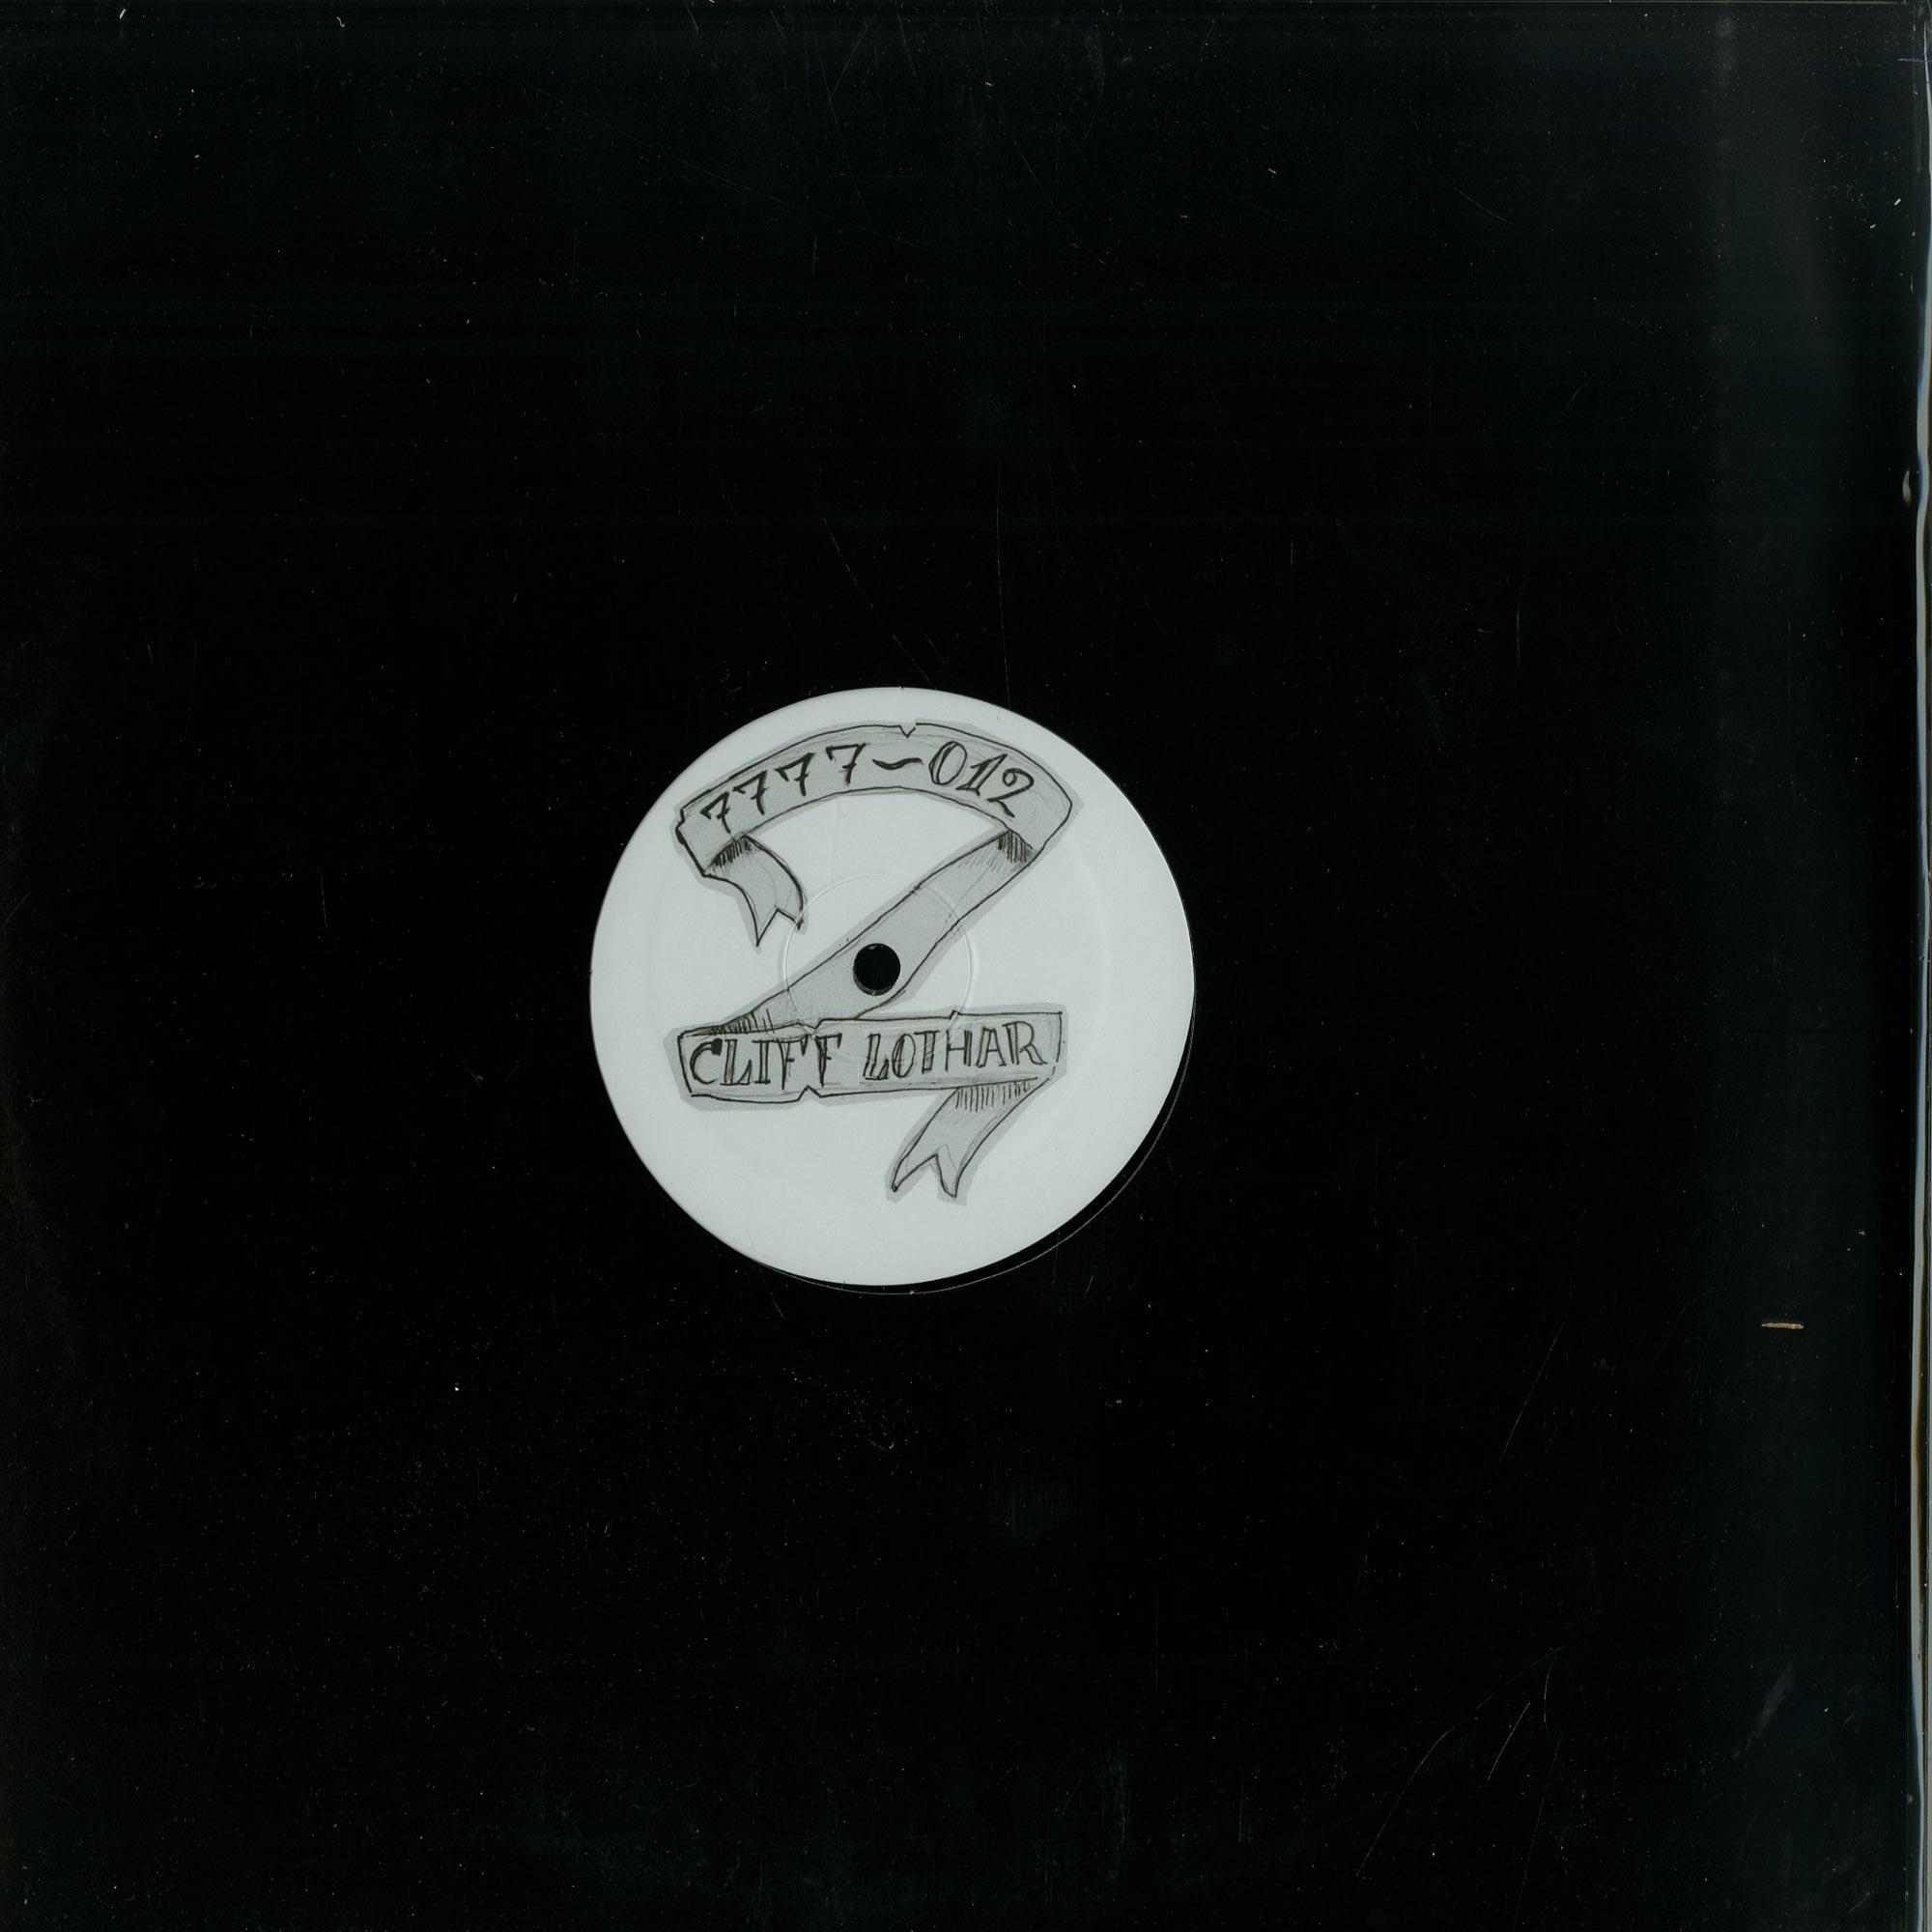 Cliff Lothar - ELECTROBITS